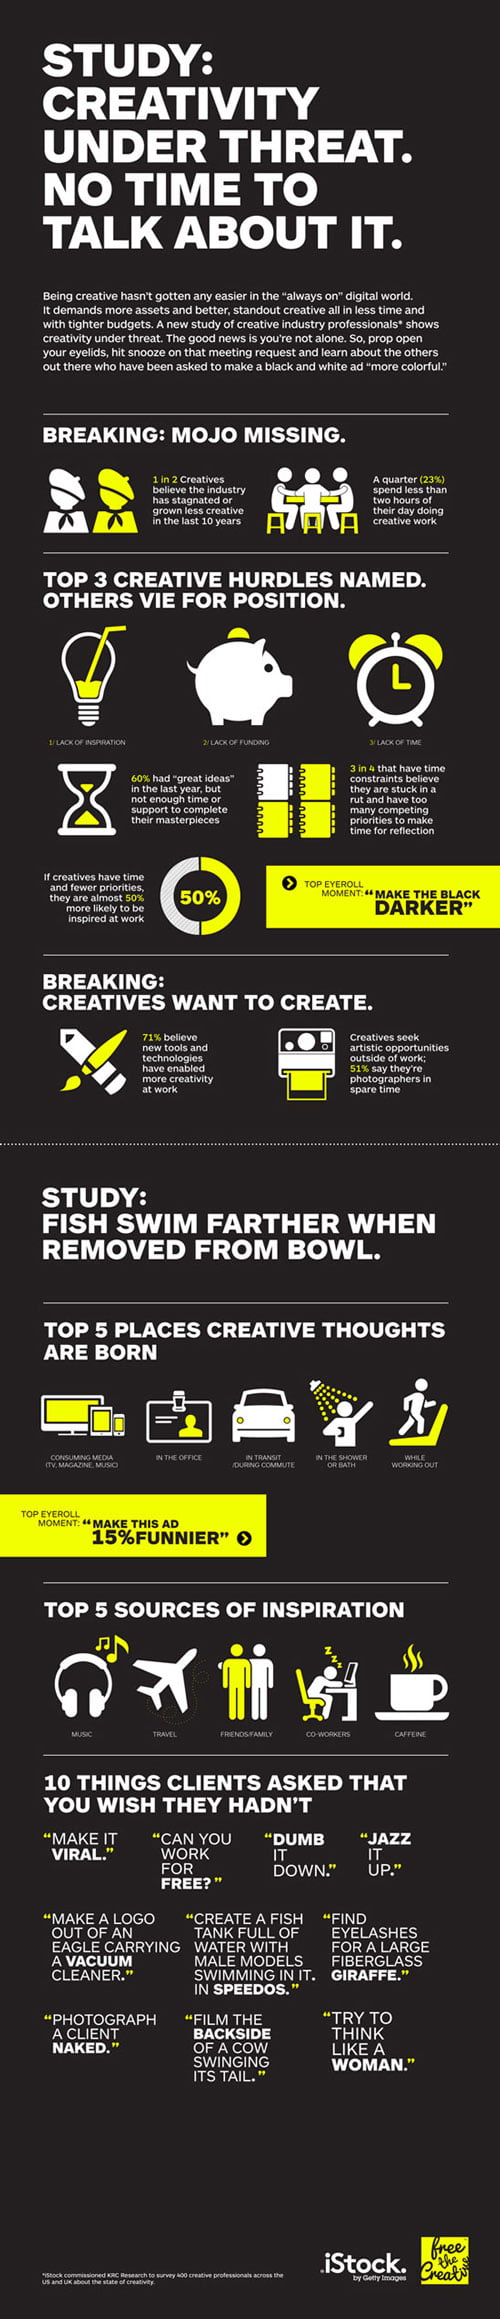 statement-of-creativity